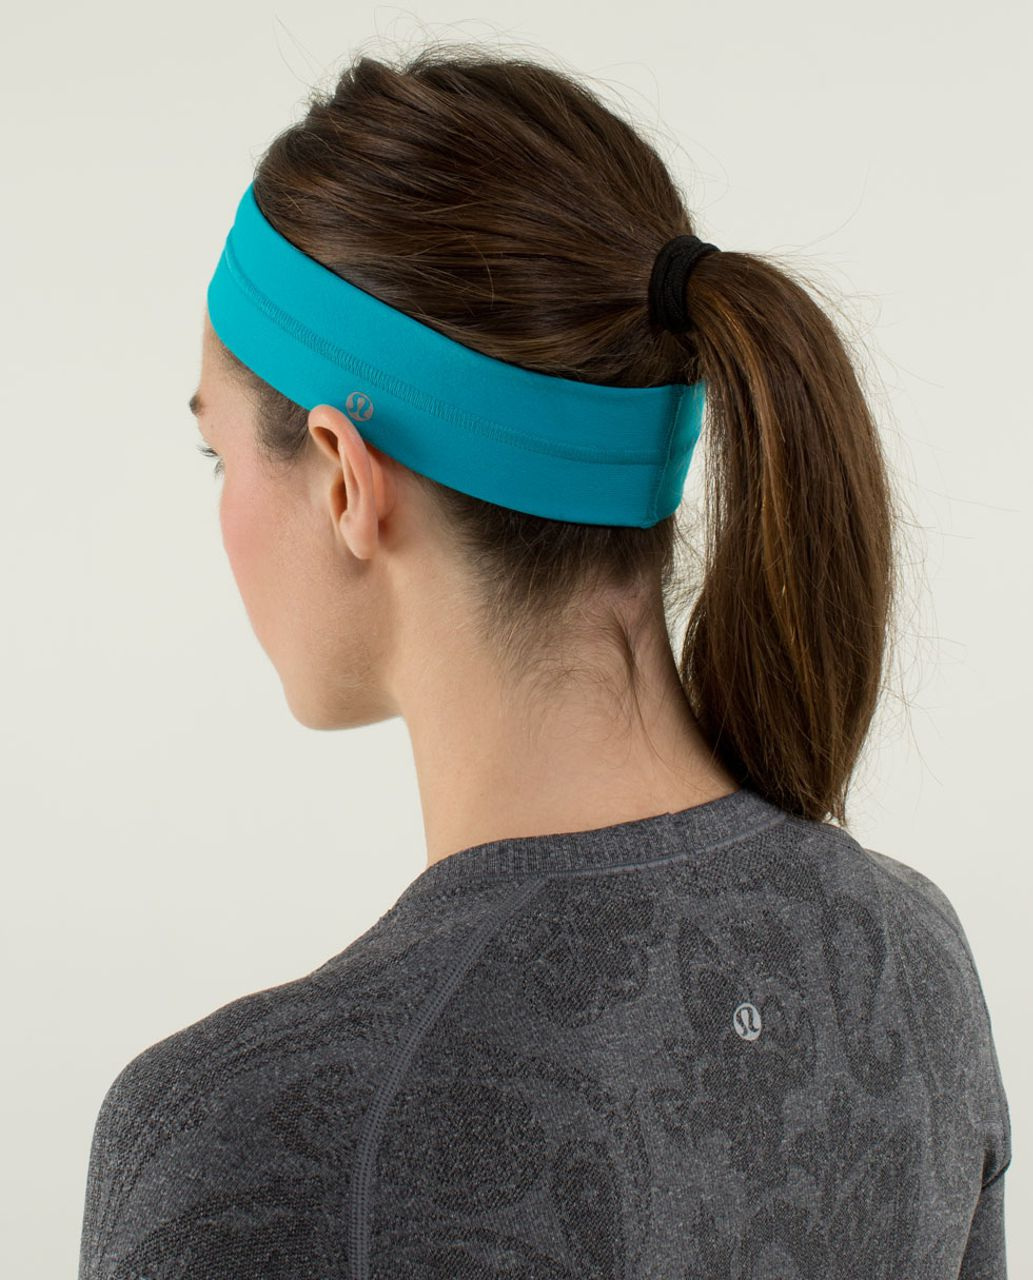 Lululemon Fly Away Tamer Headband - Surge